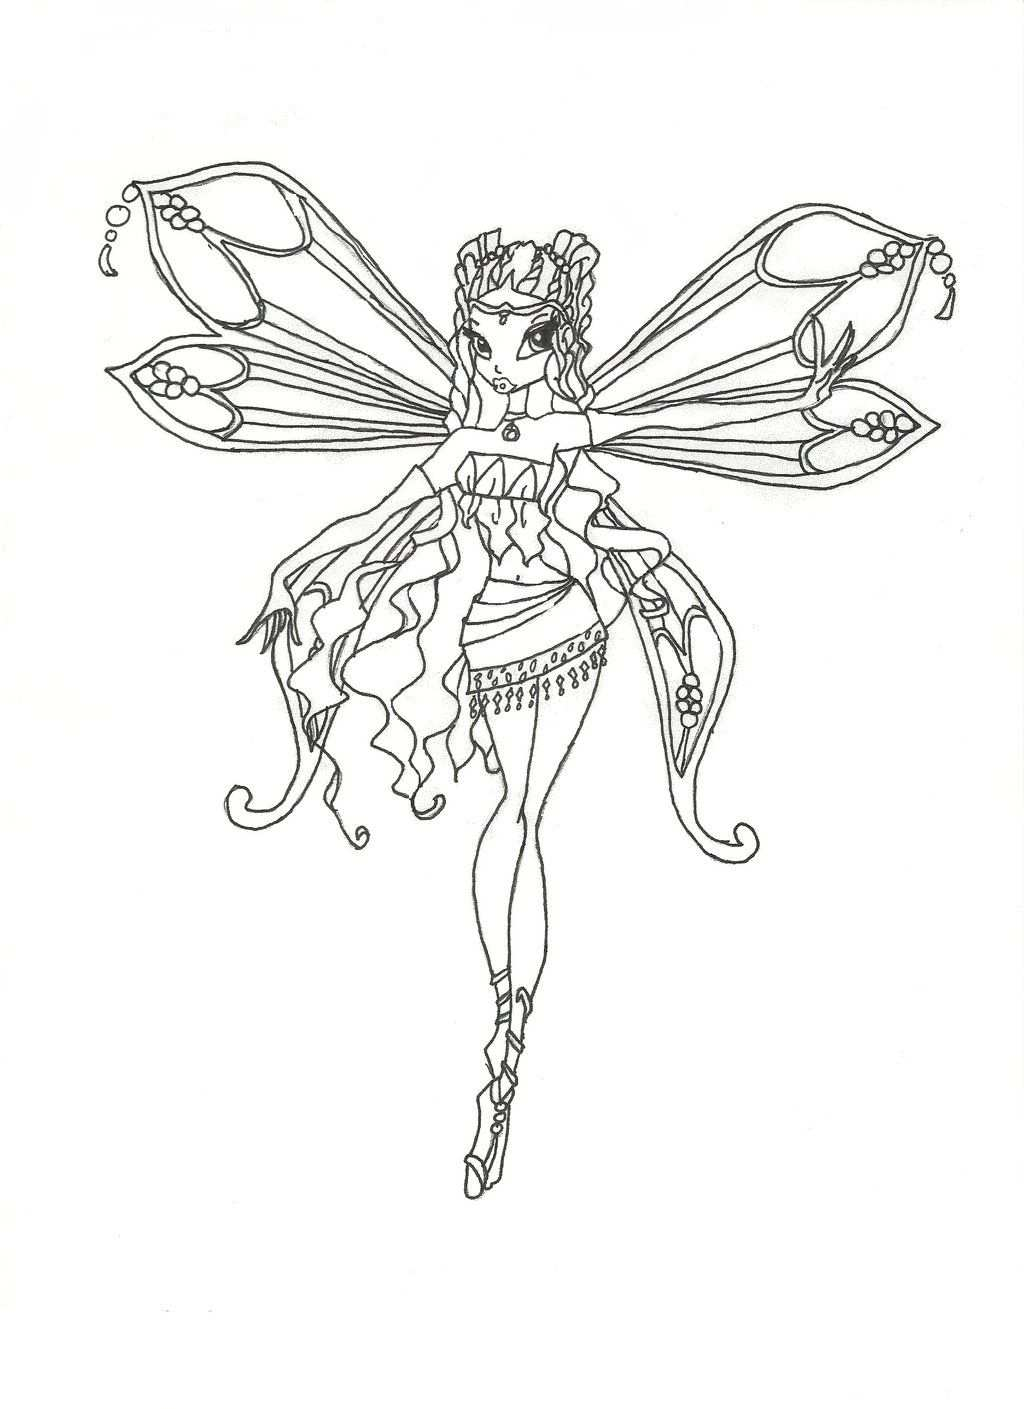 Winx Club Enchantix Layla Coloring Page By Winxmagic237 Deviantart